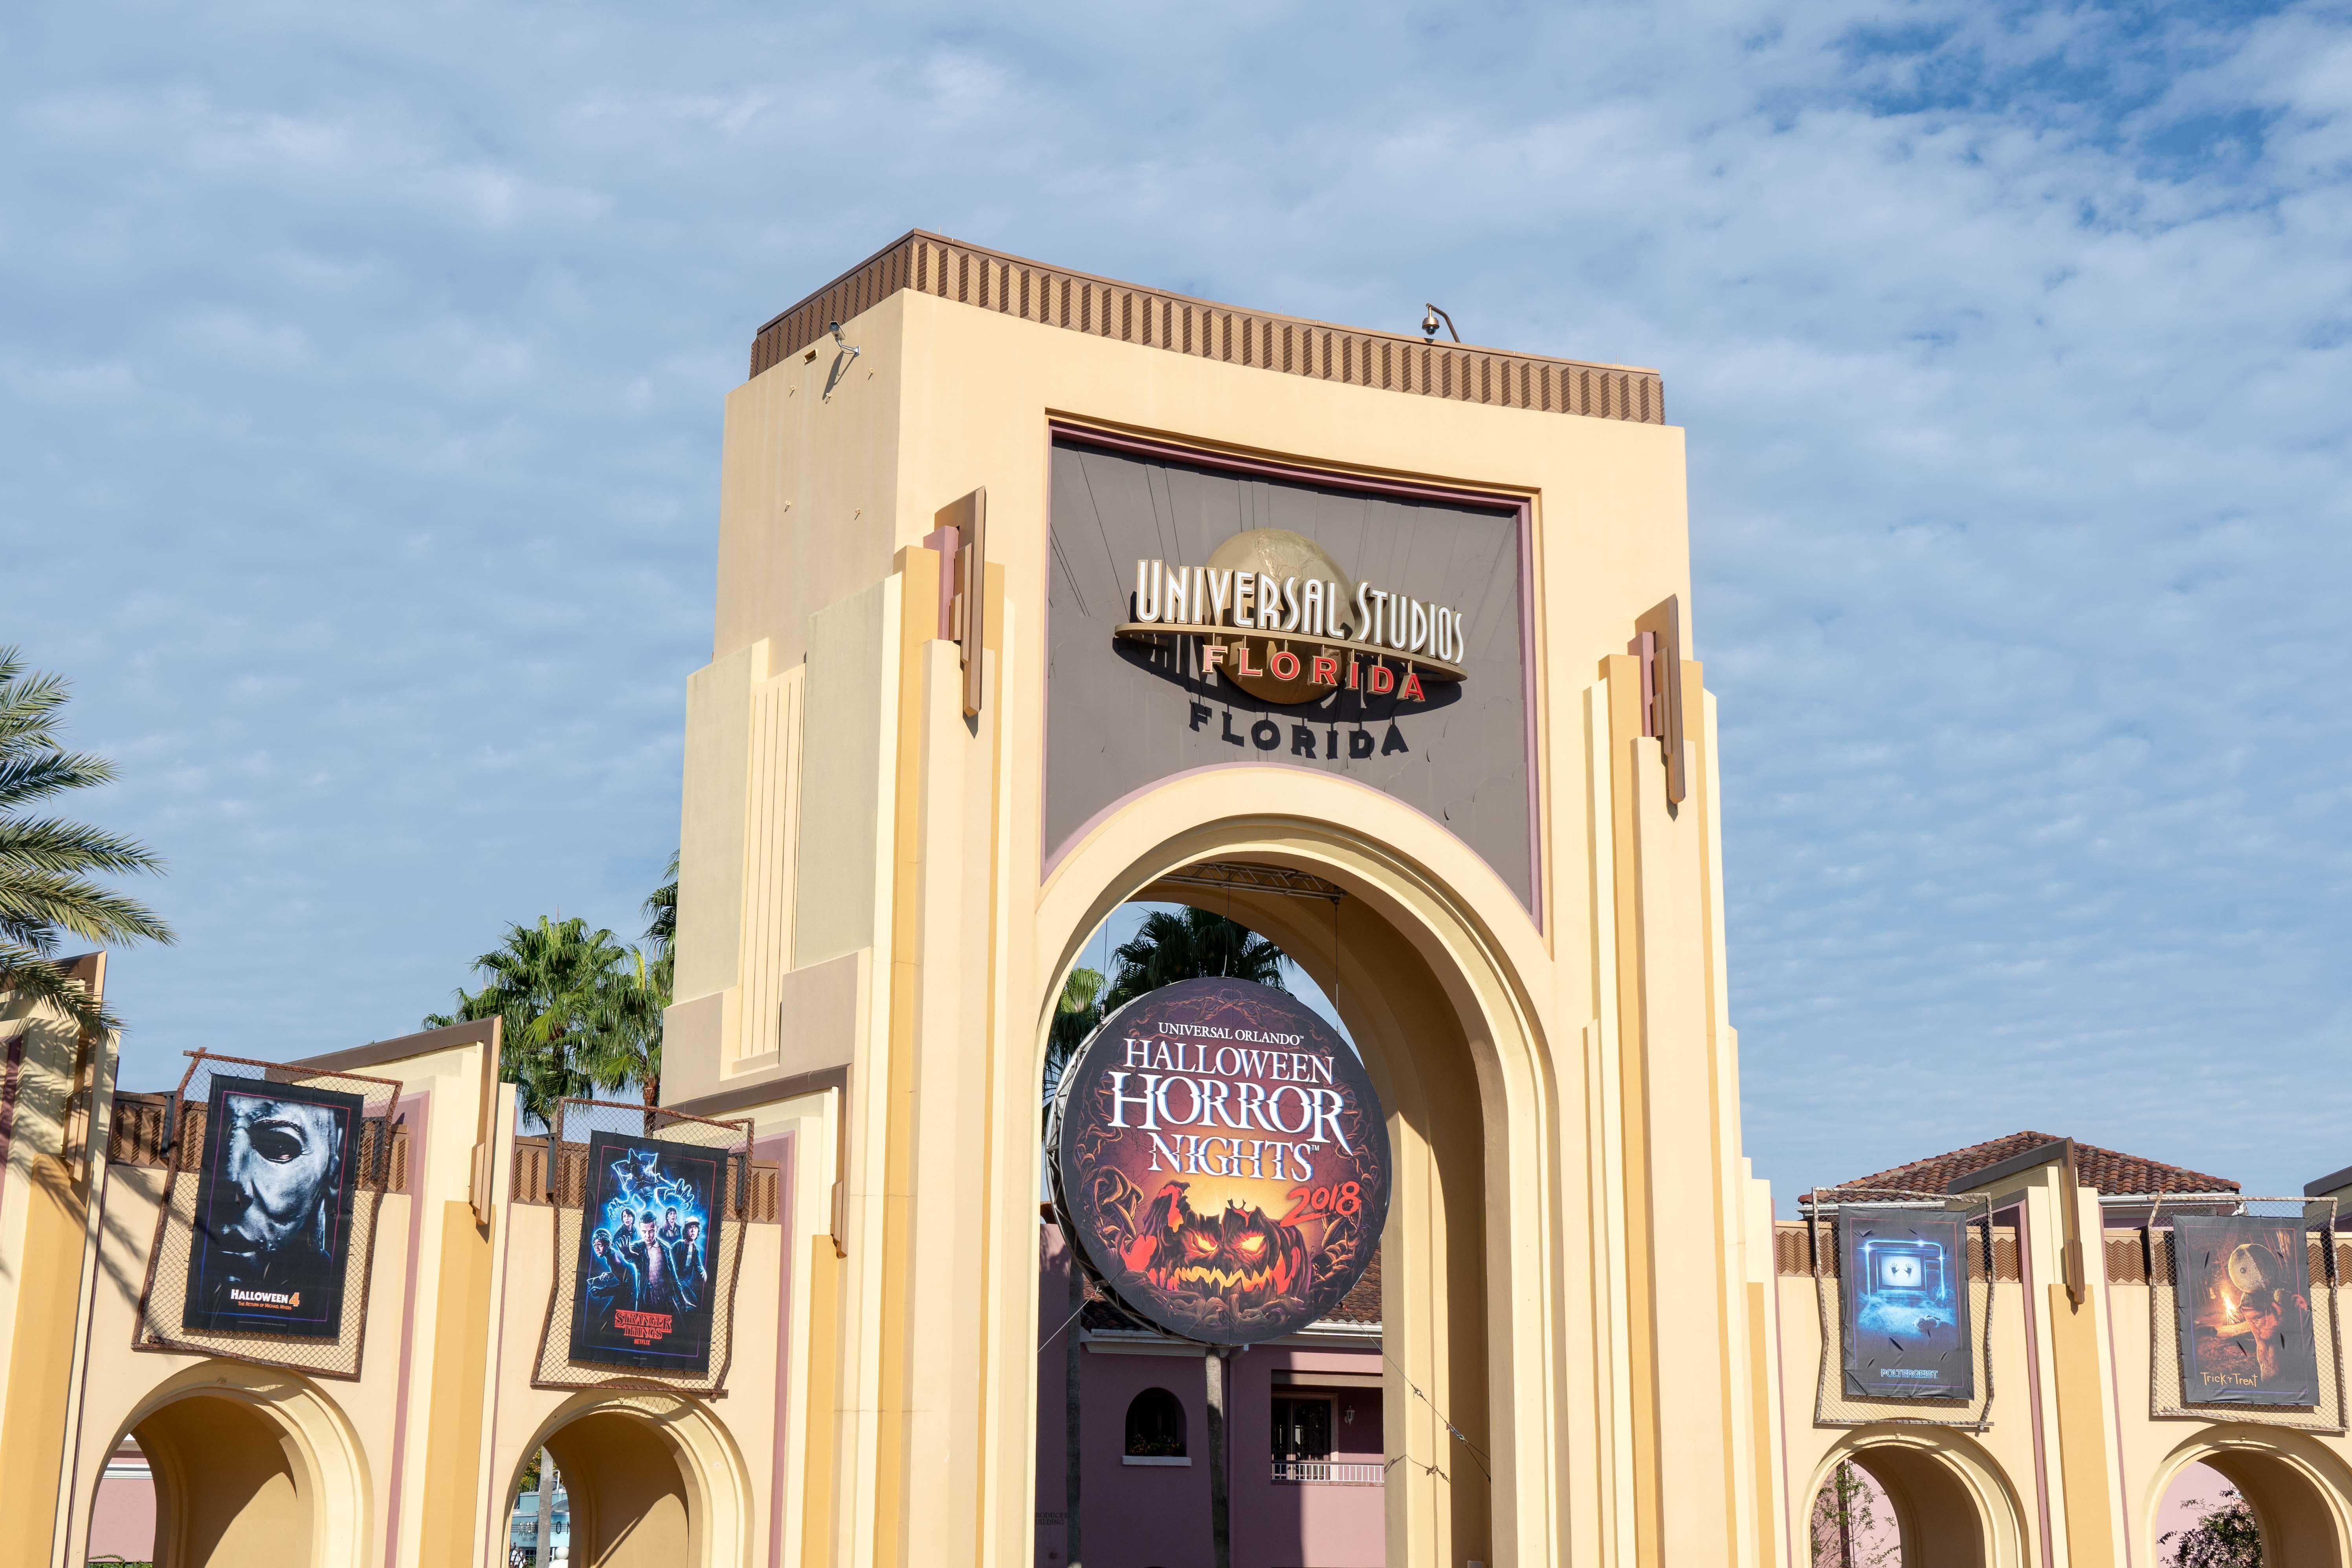 Visiter Universal Studios Florida Entrance Gate Park